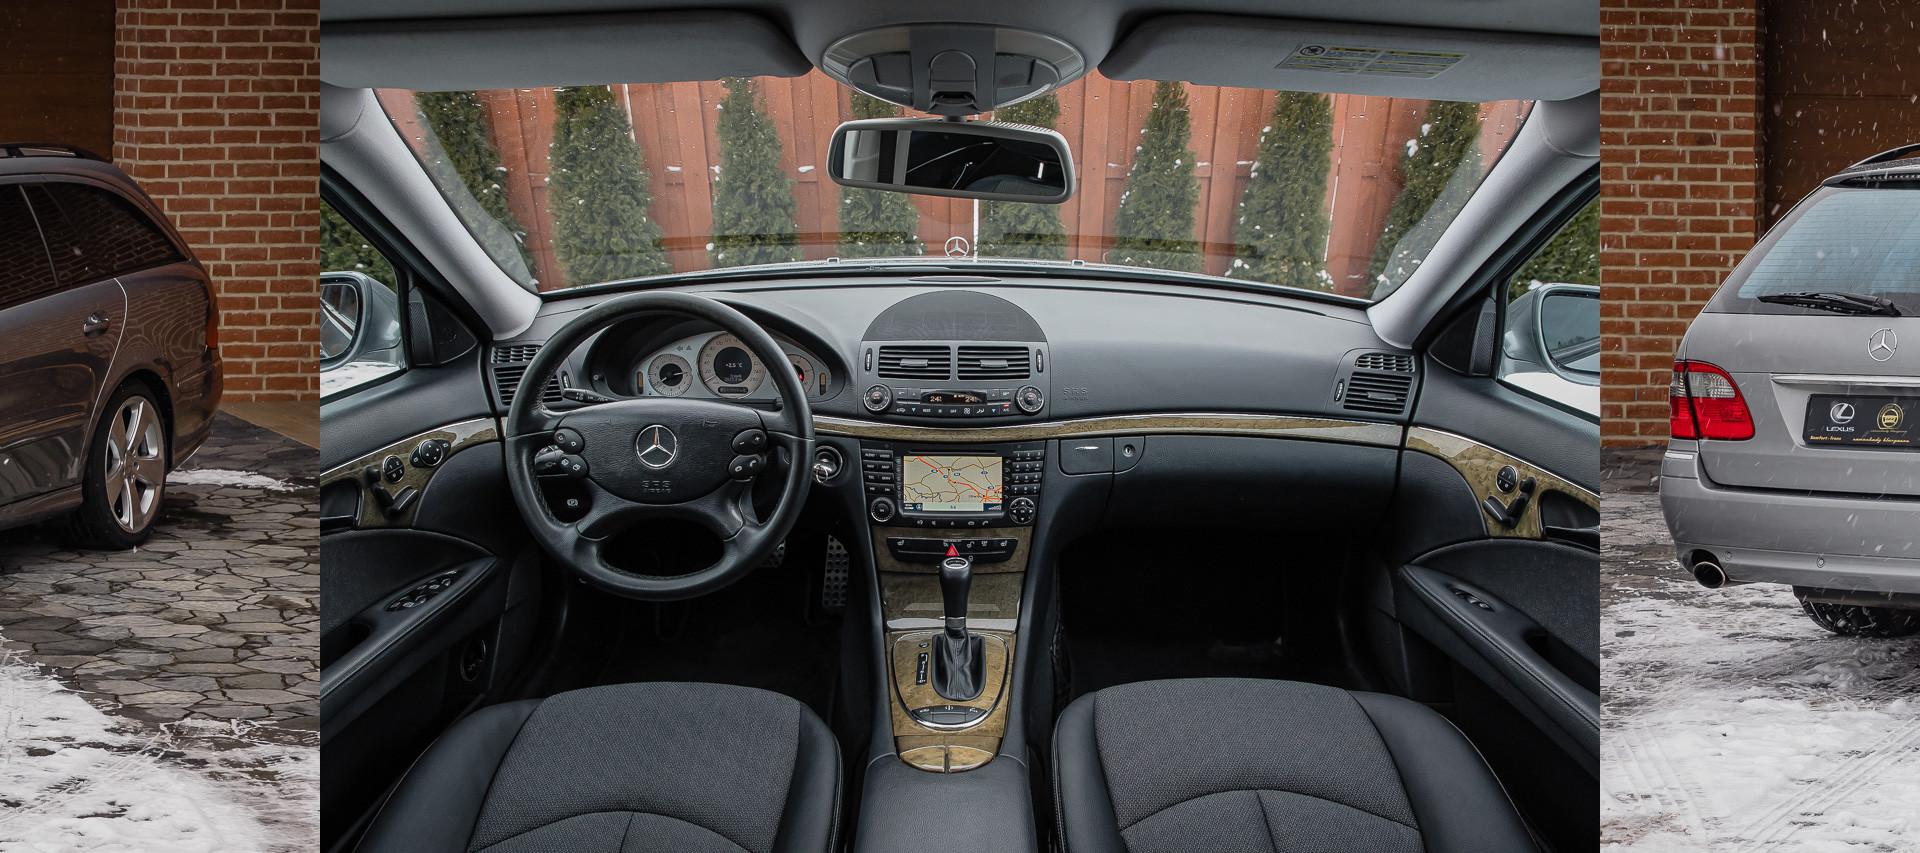 Mercedes E320 T CDI 7G-Tronic Avangarde